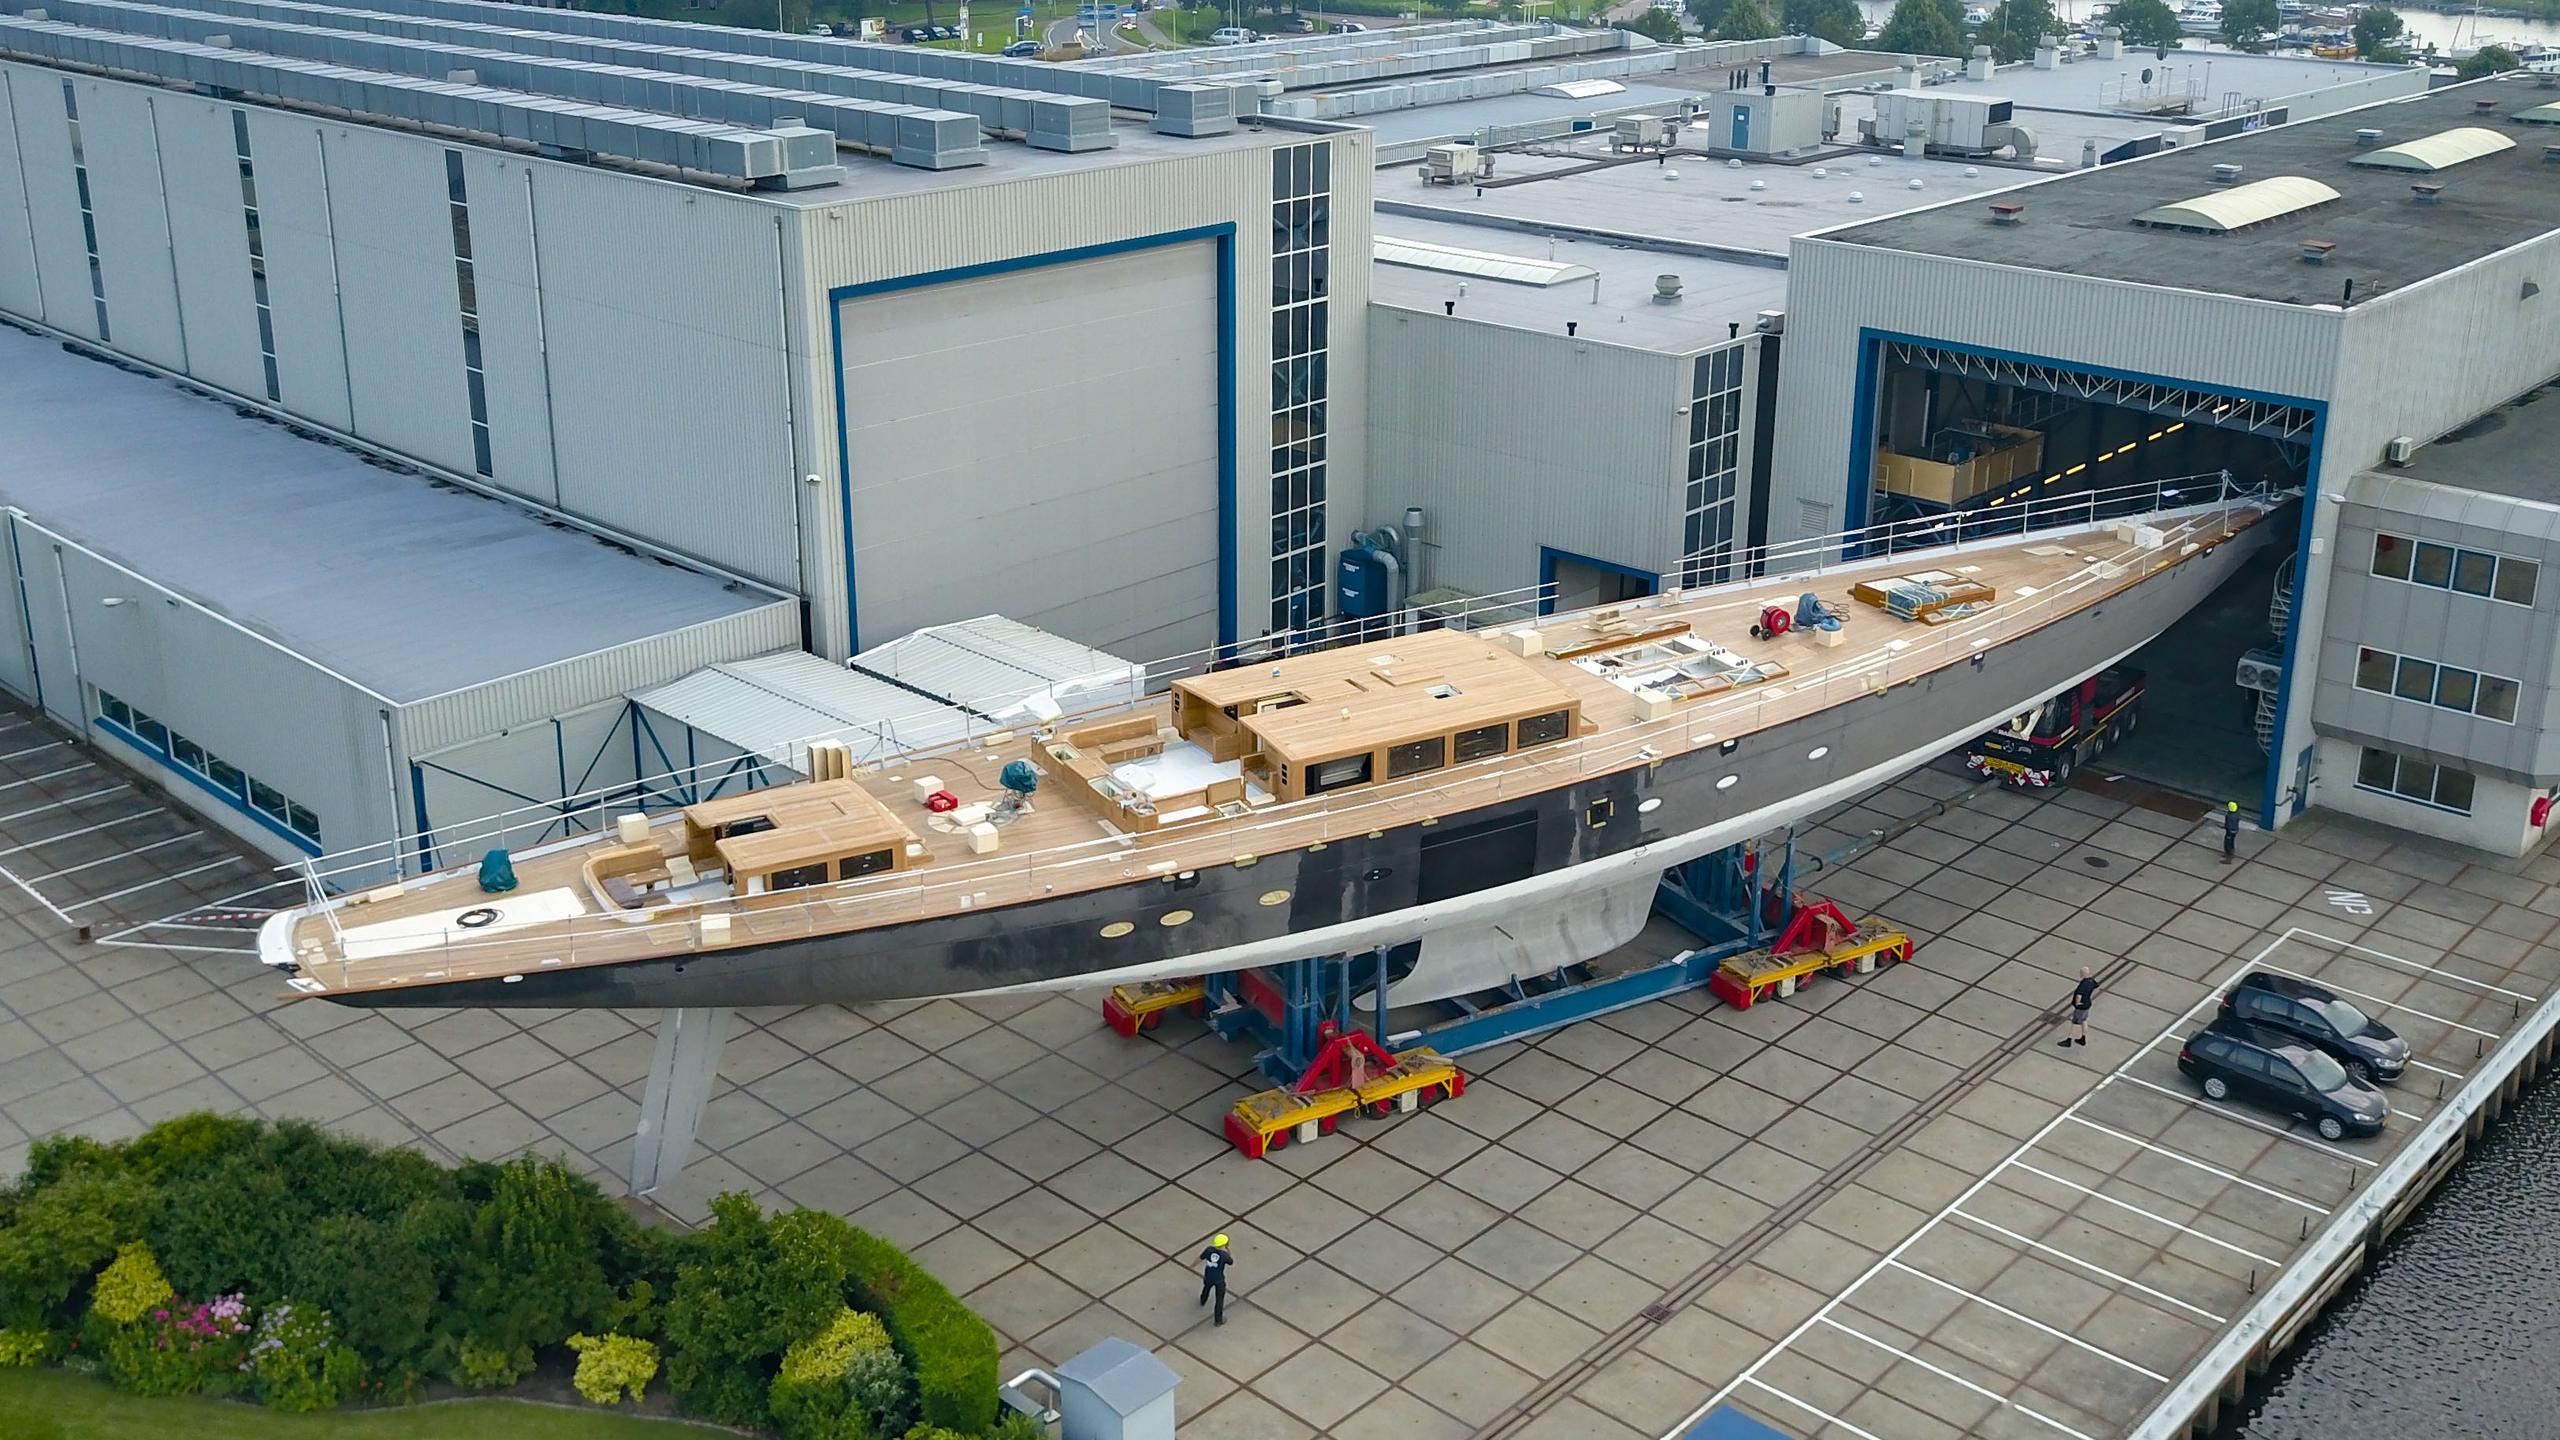 aquarius sailing yacht royal huisman 56m 2018 under construction aerial